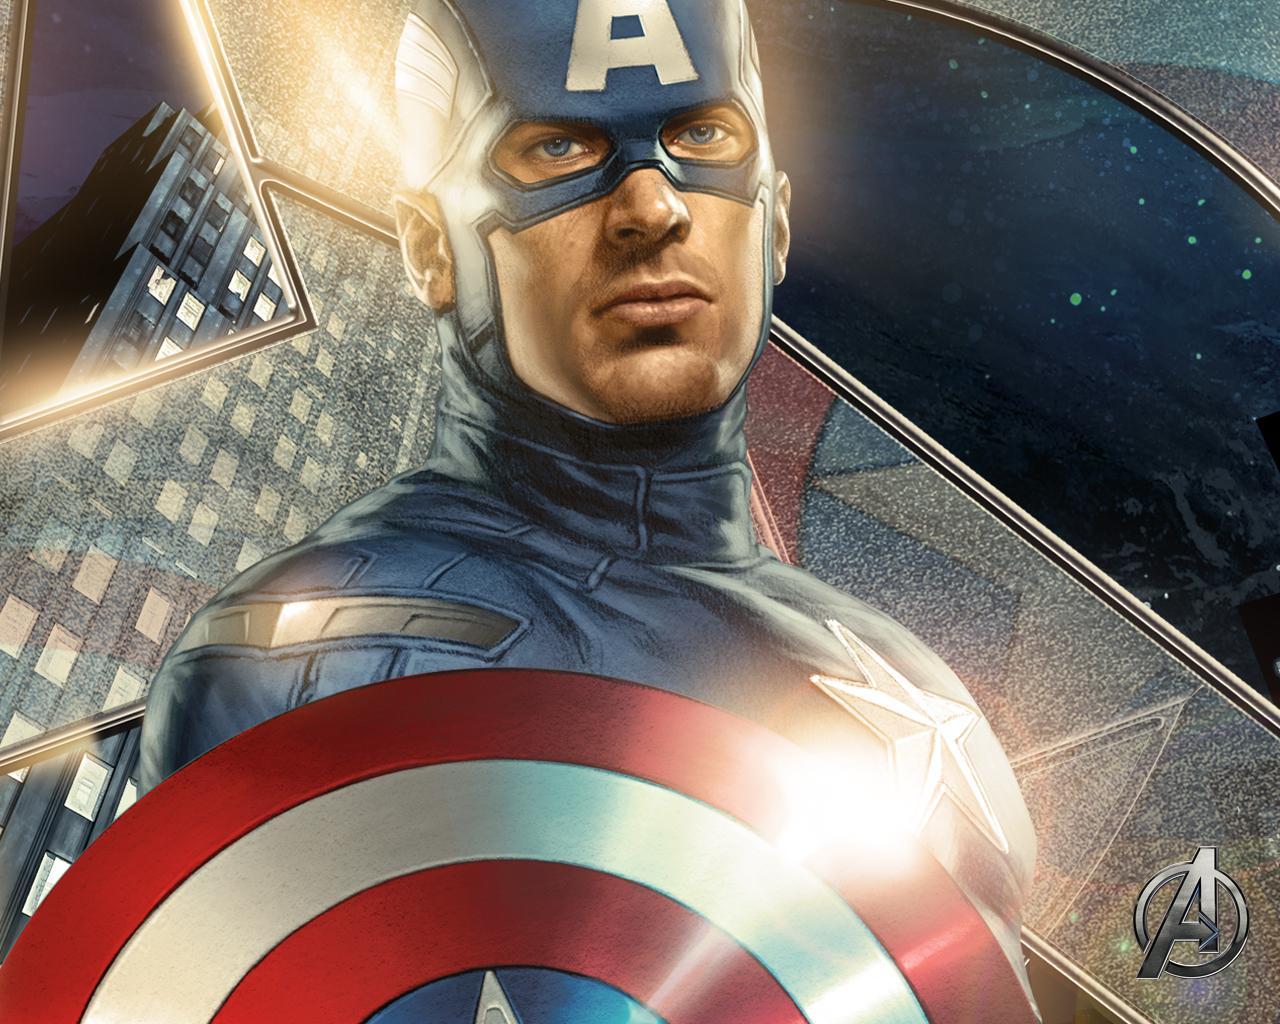 Captain america avengers hd wallpaper hd wallpapers - Image captain america ...